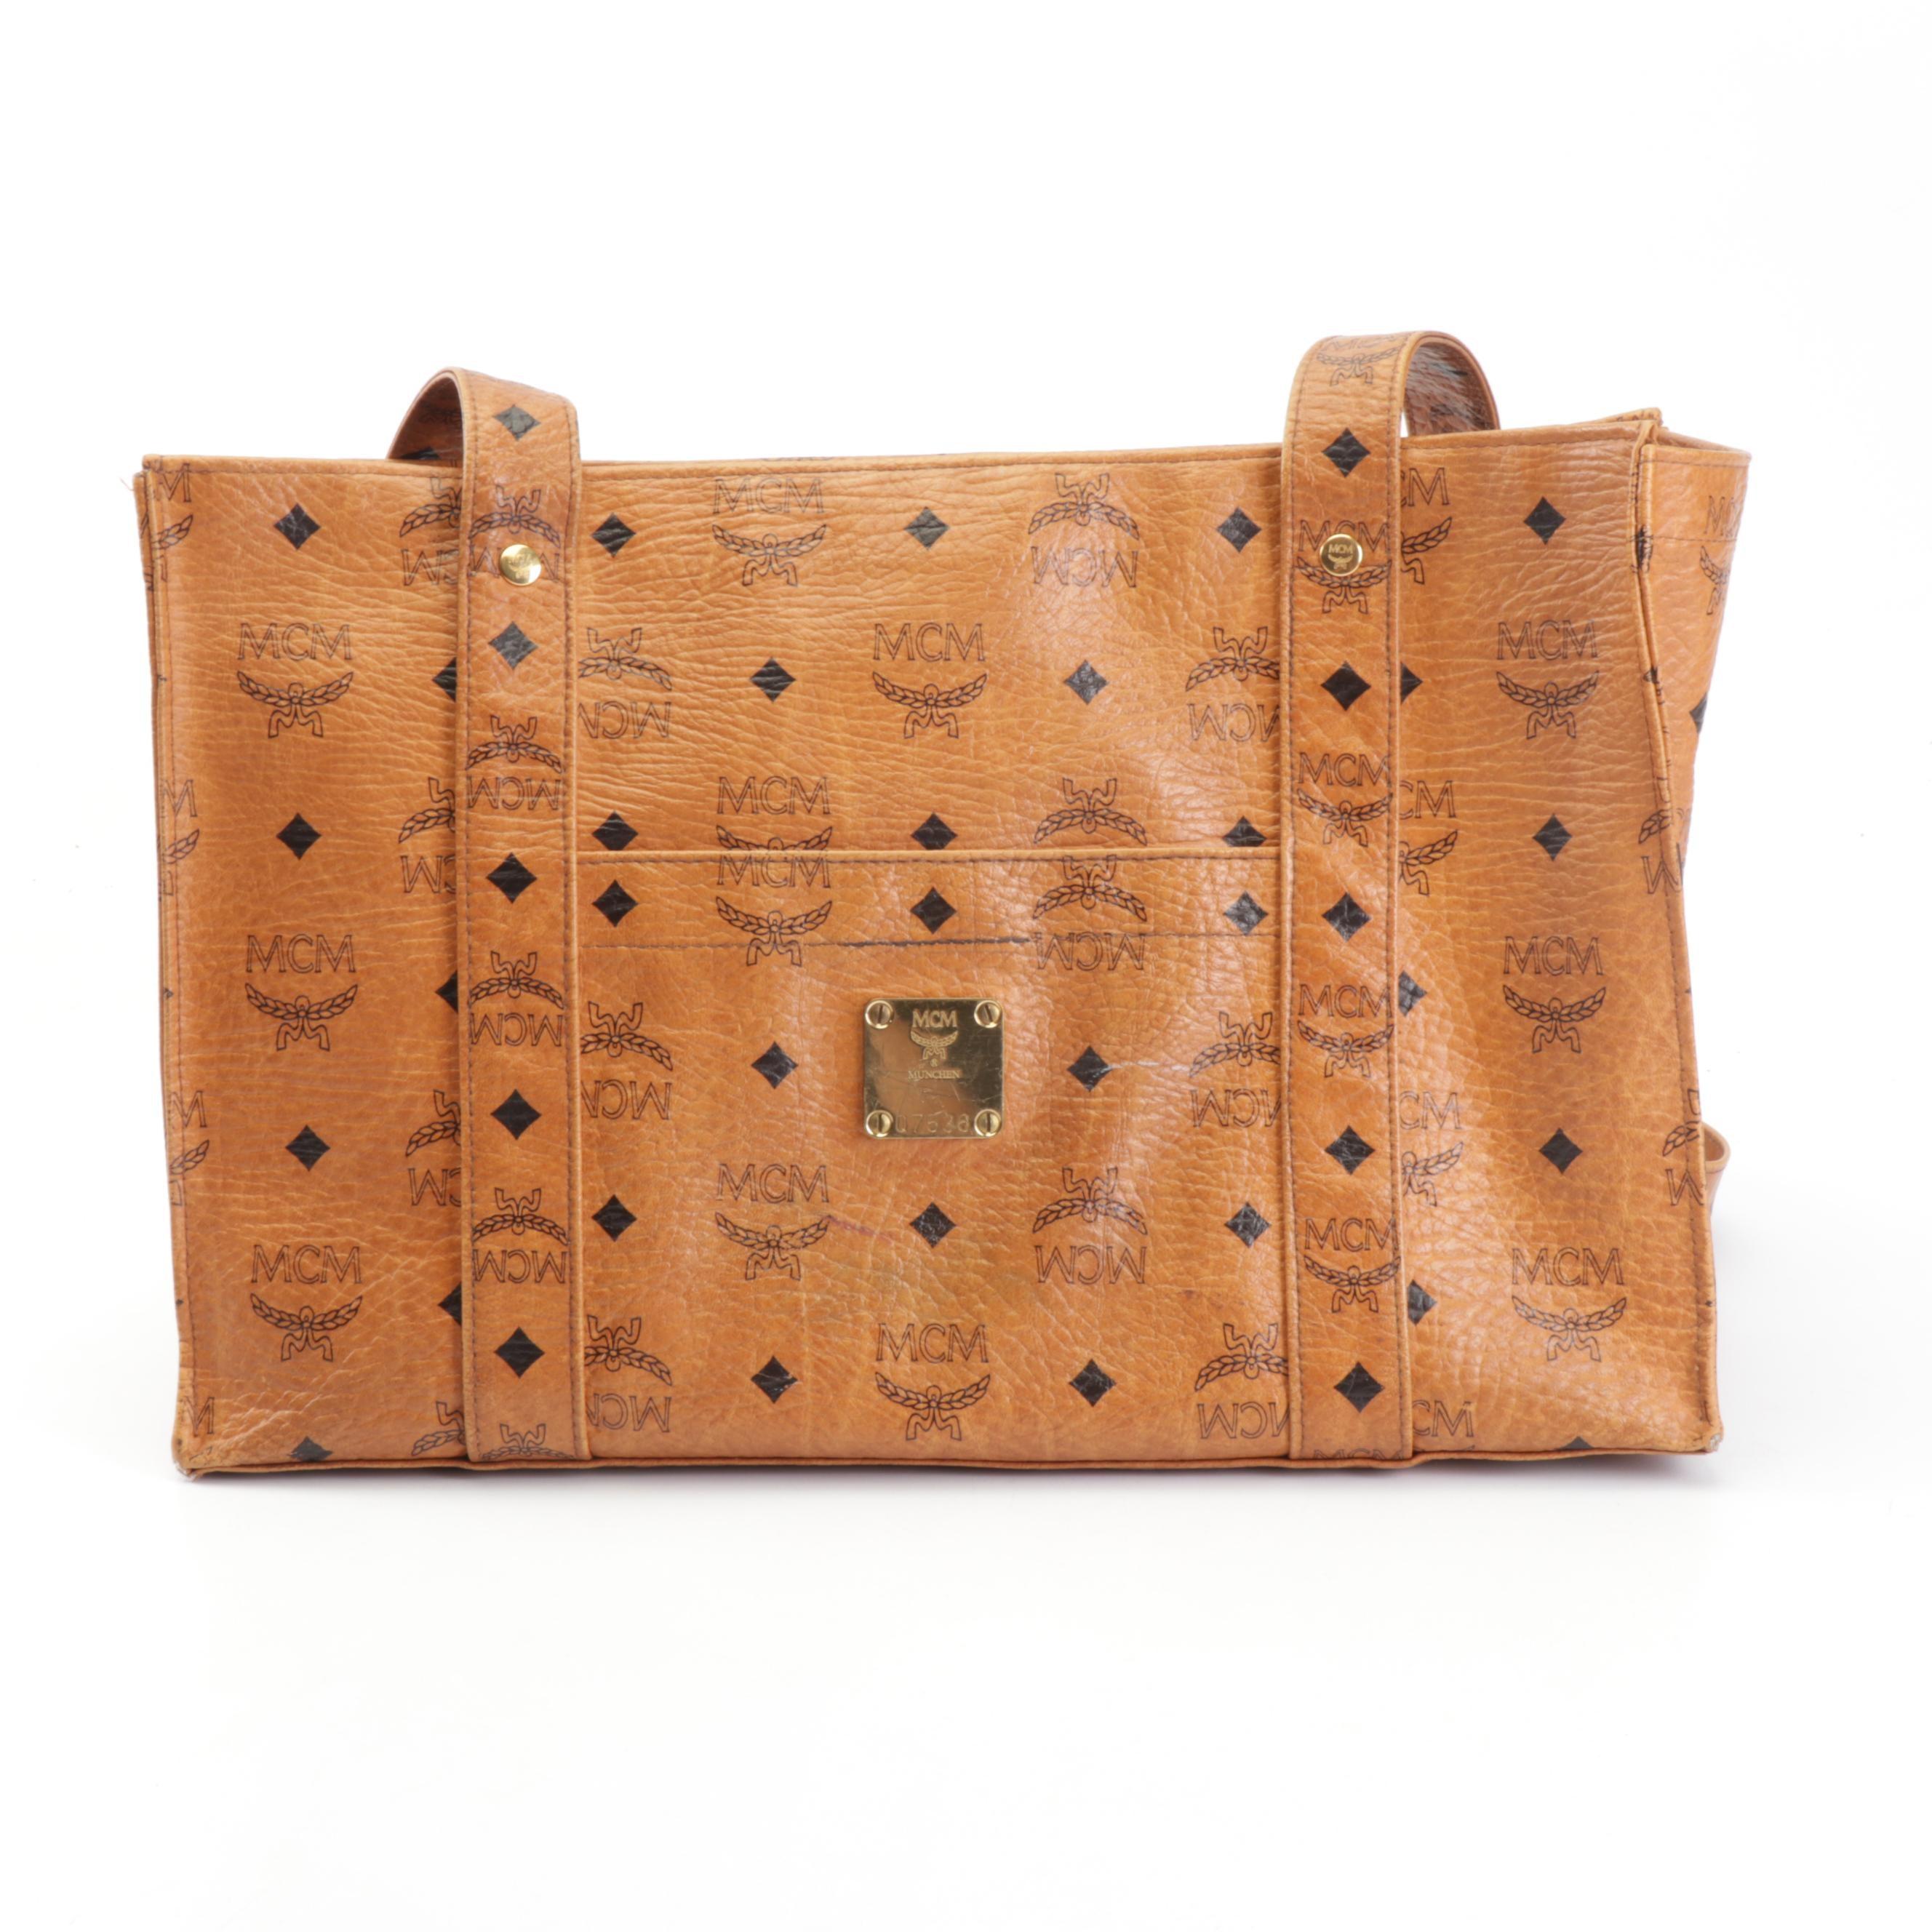 MCM Munchen Monogram and Diamond Cognac Visetos Tote Bag, Vintage